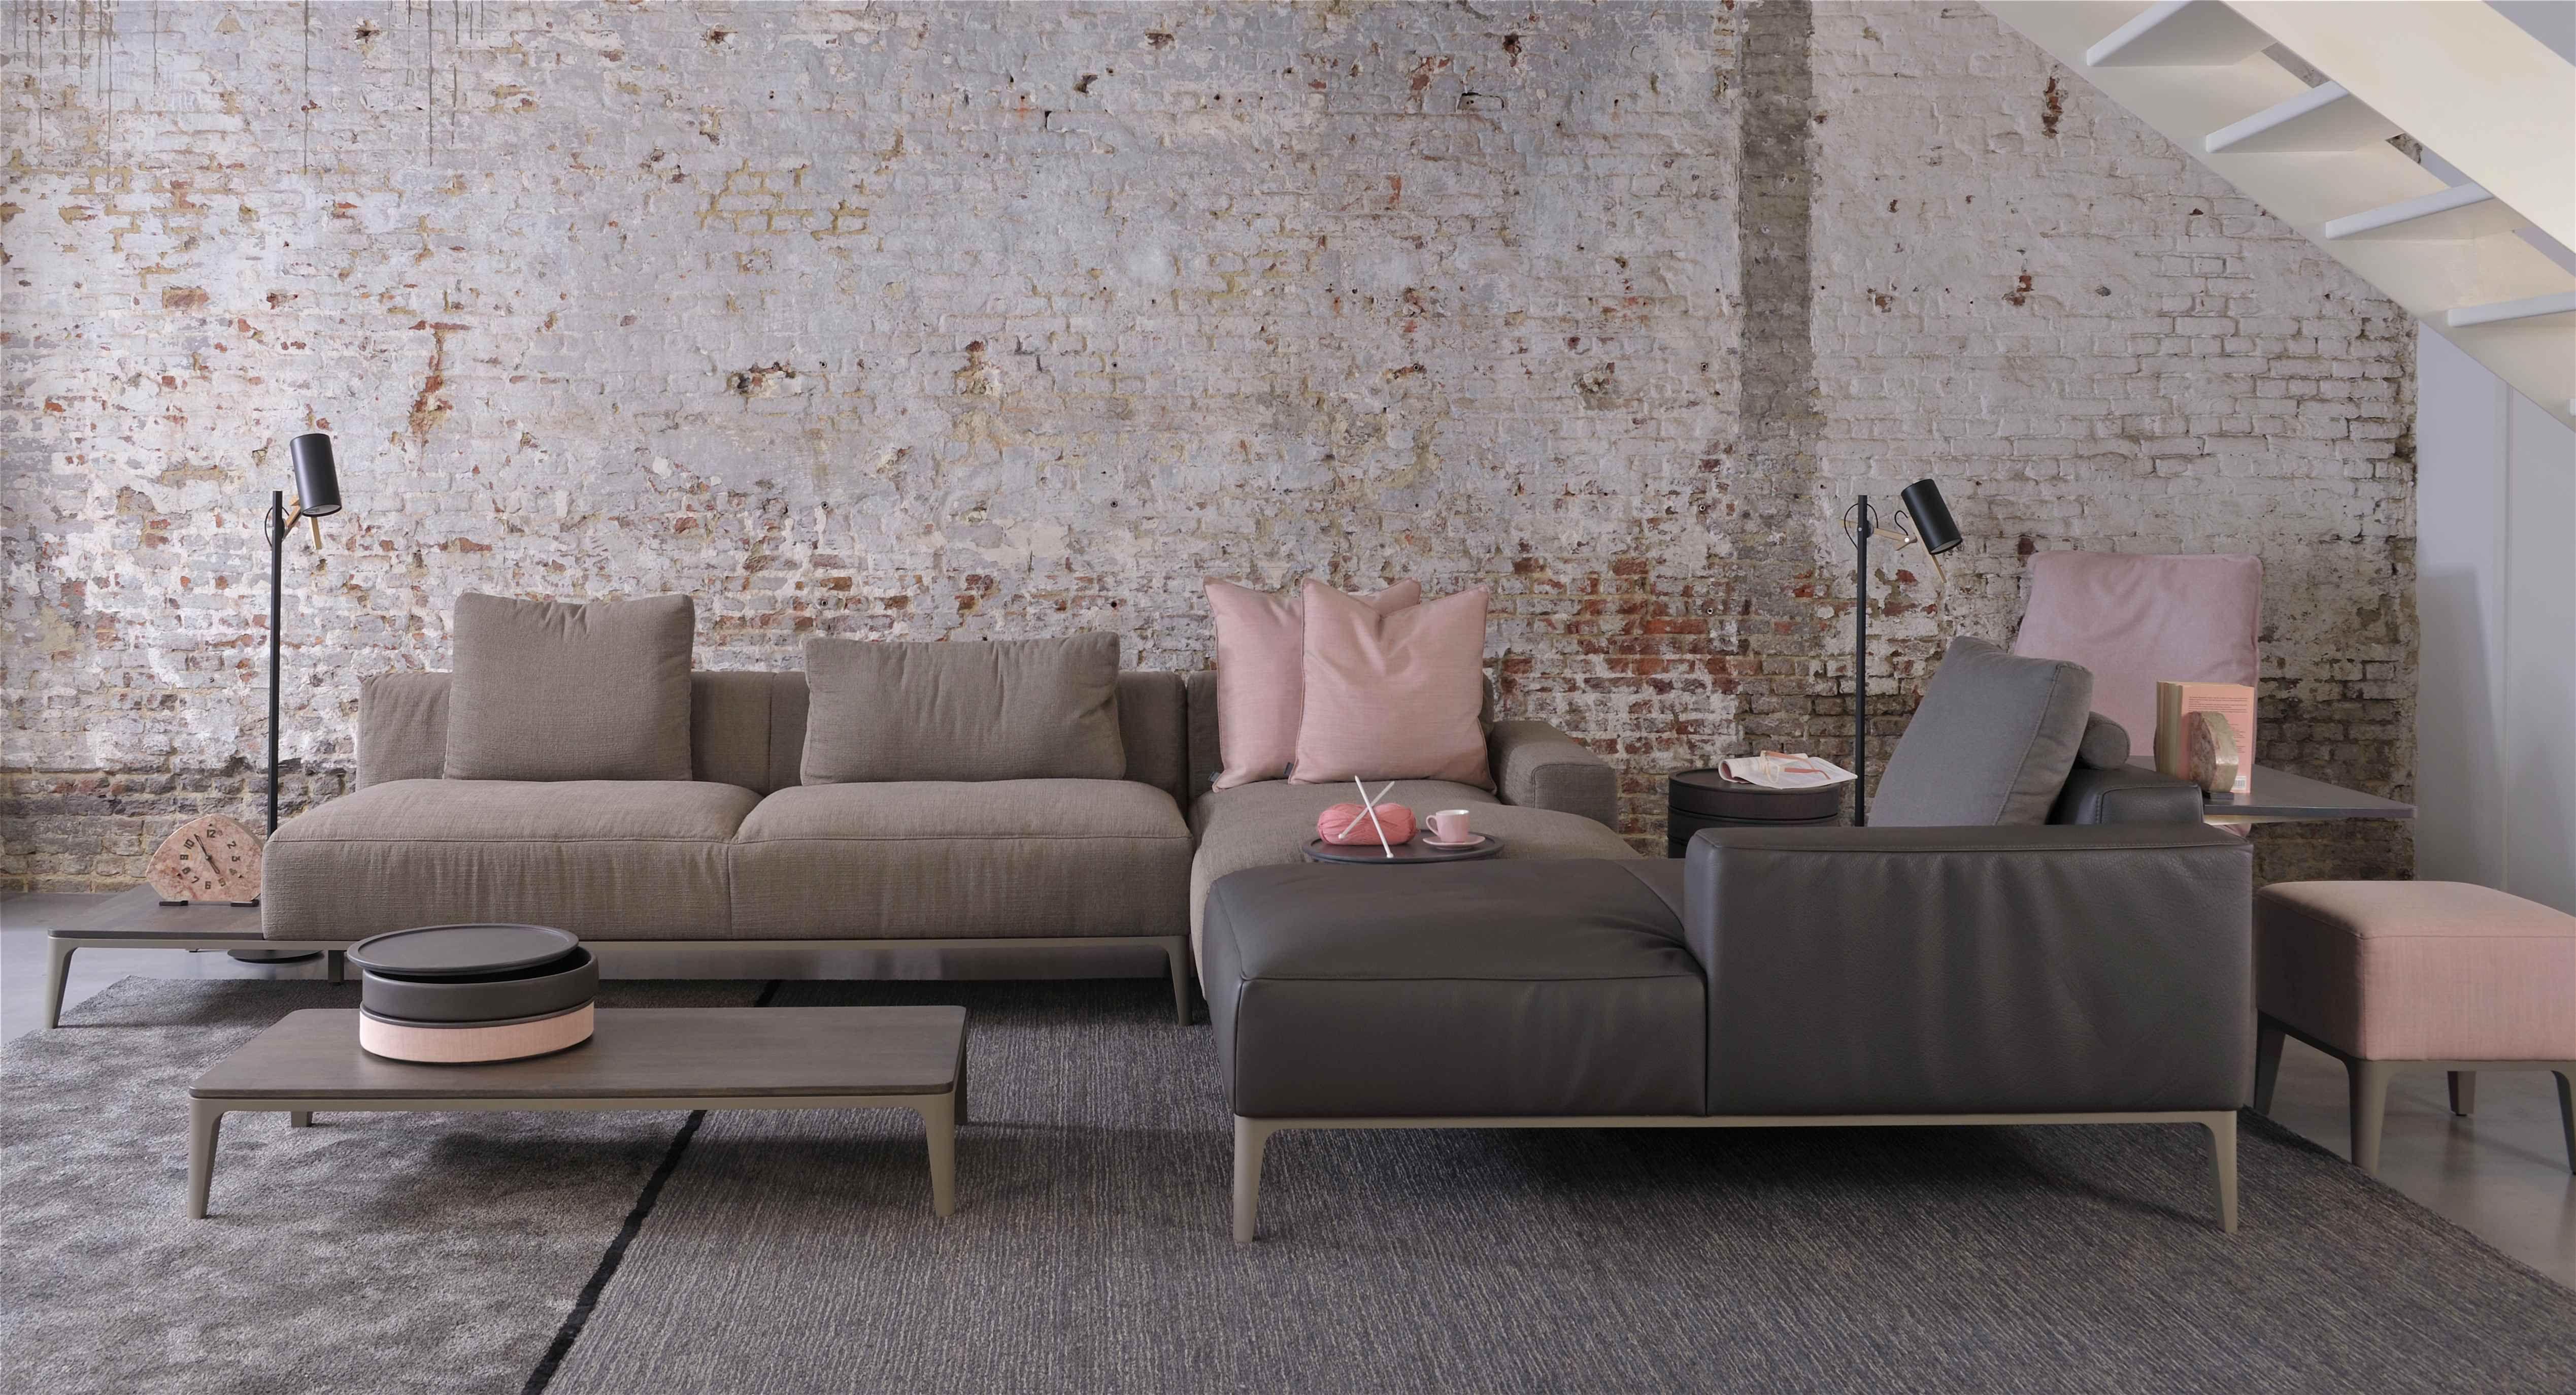 Indera Tailor Made sofa selected by Altera